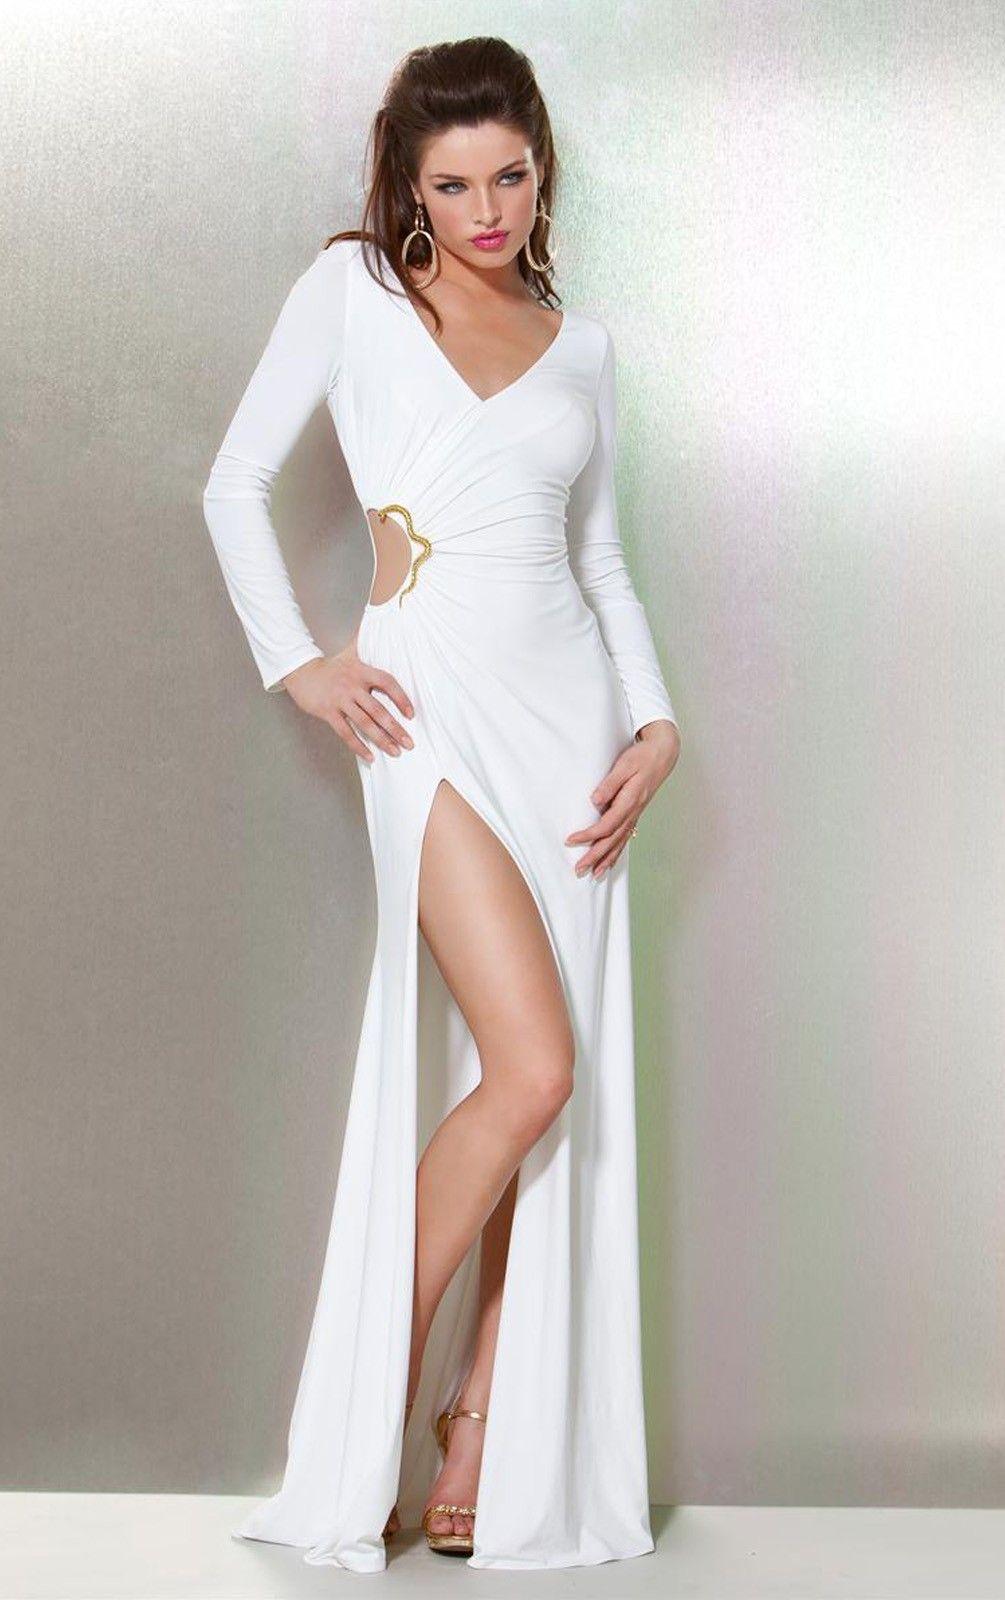 Prom dress prom night pinterest dresses prom dresses and